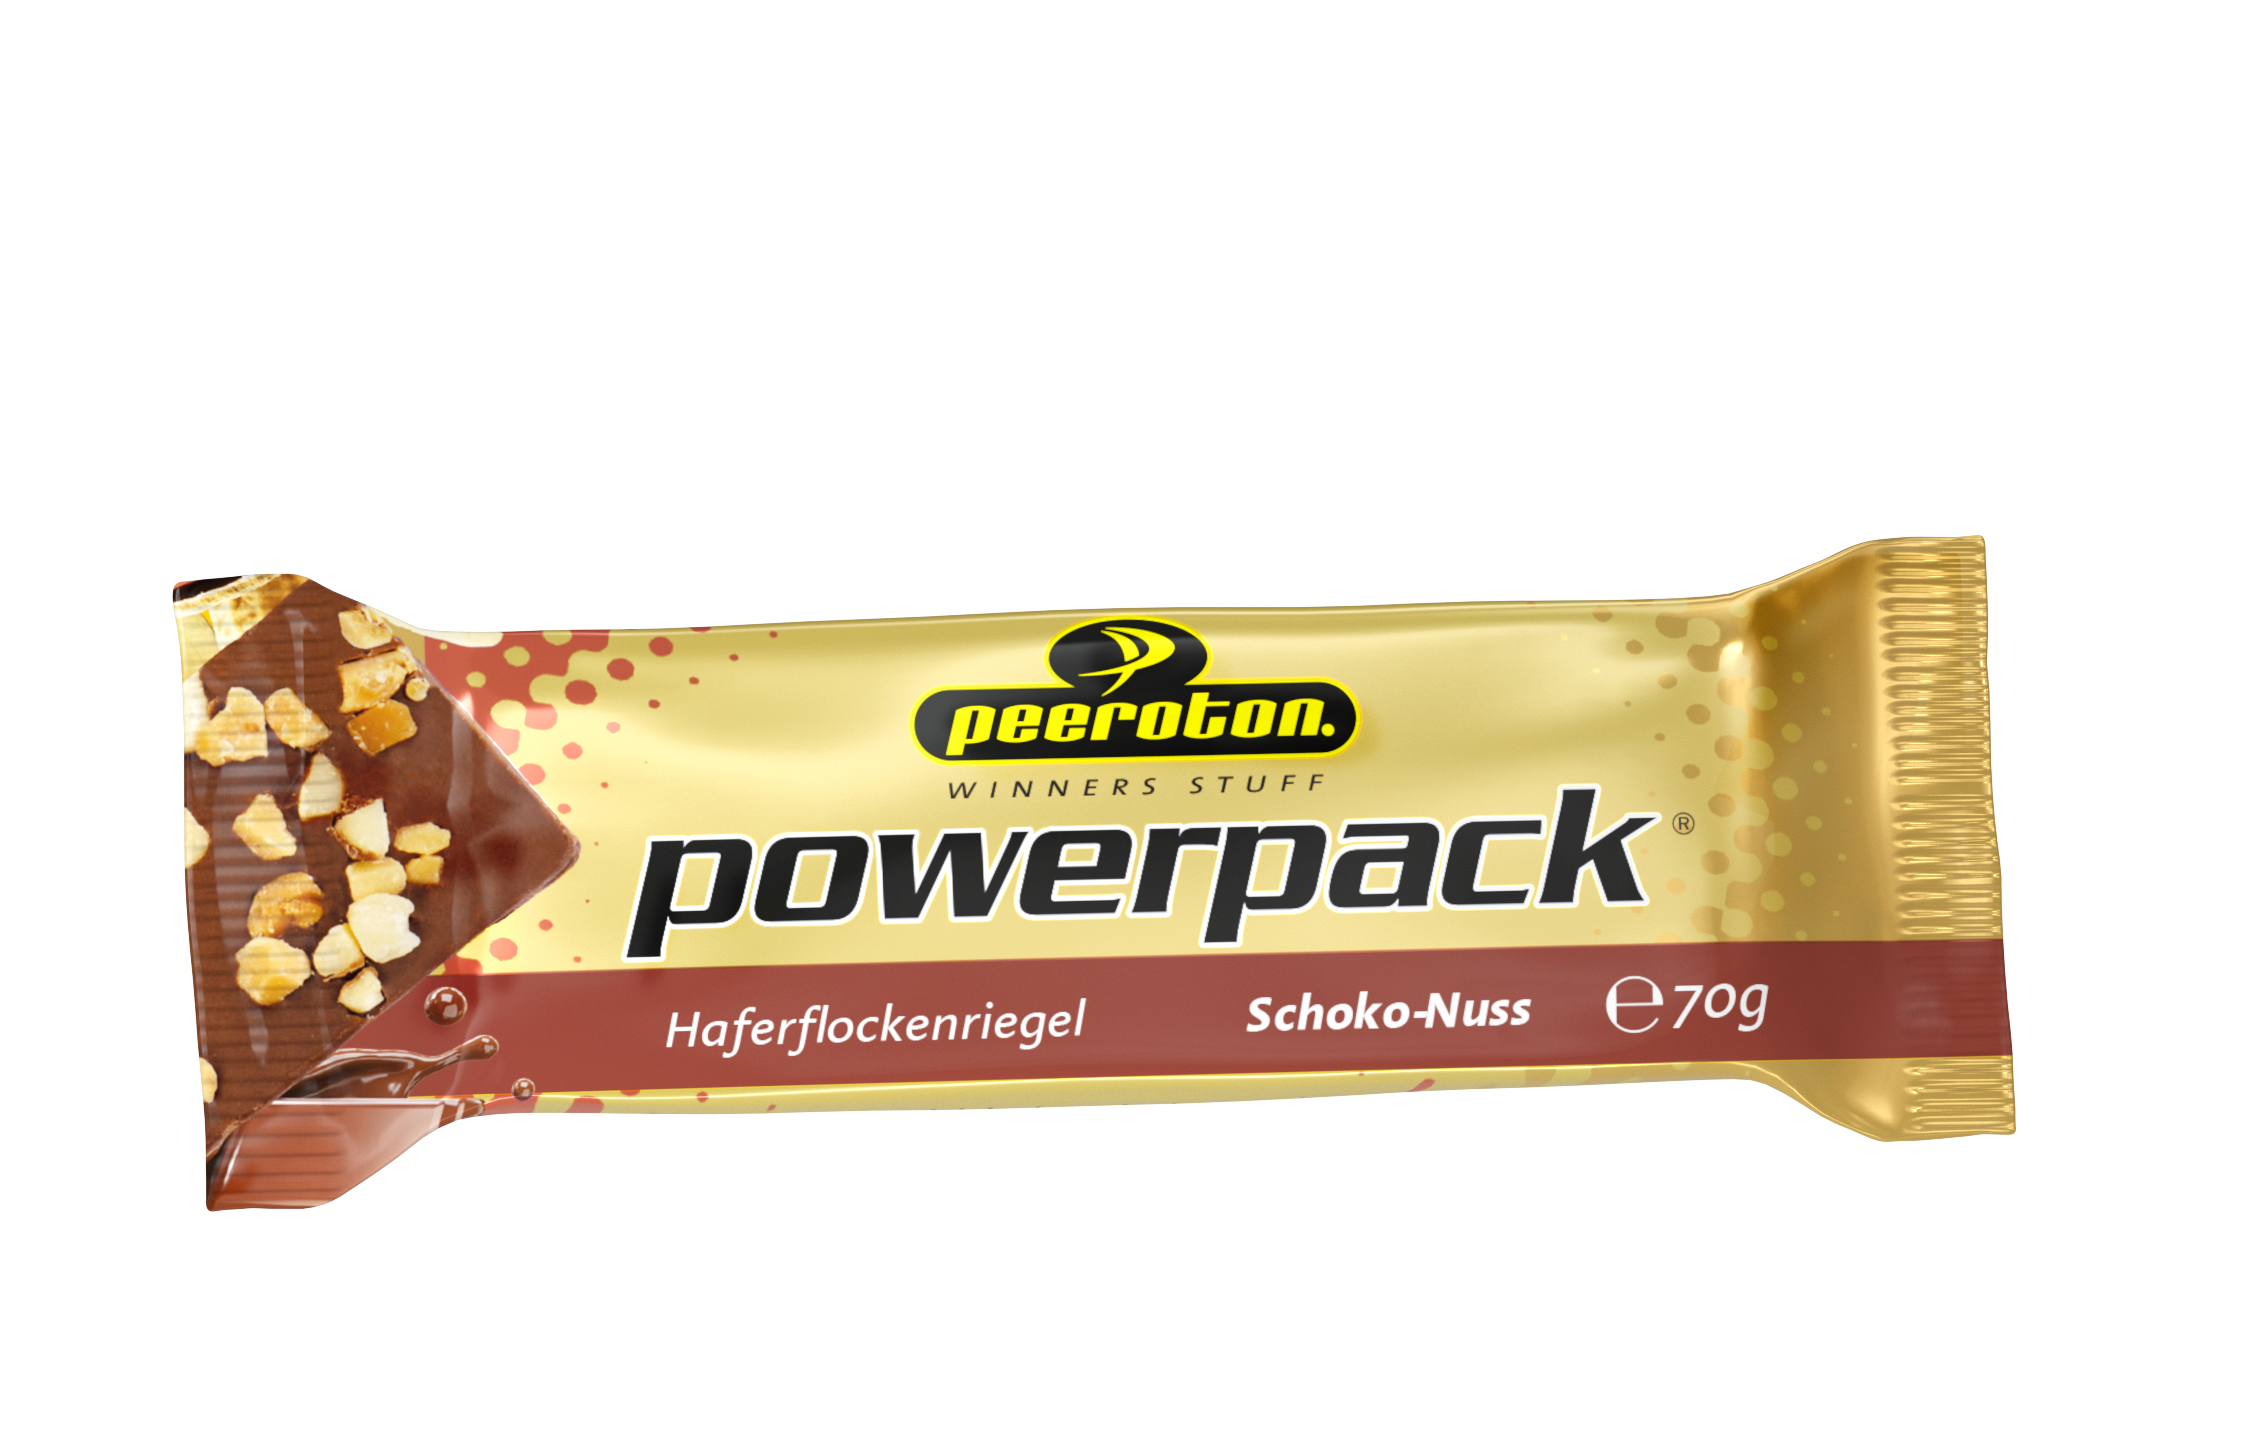 Peeroton POWERPACK Riegel 70g Schoko-Nuss, 12 + 3 Gratis